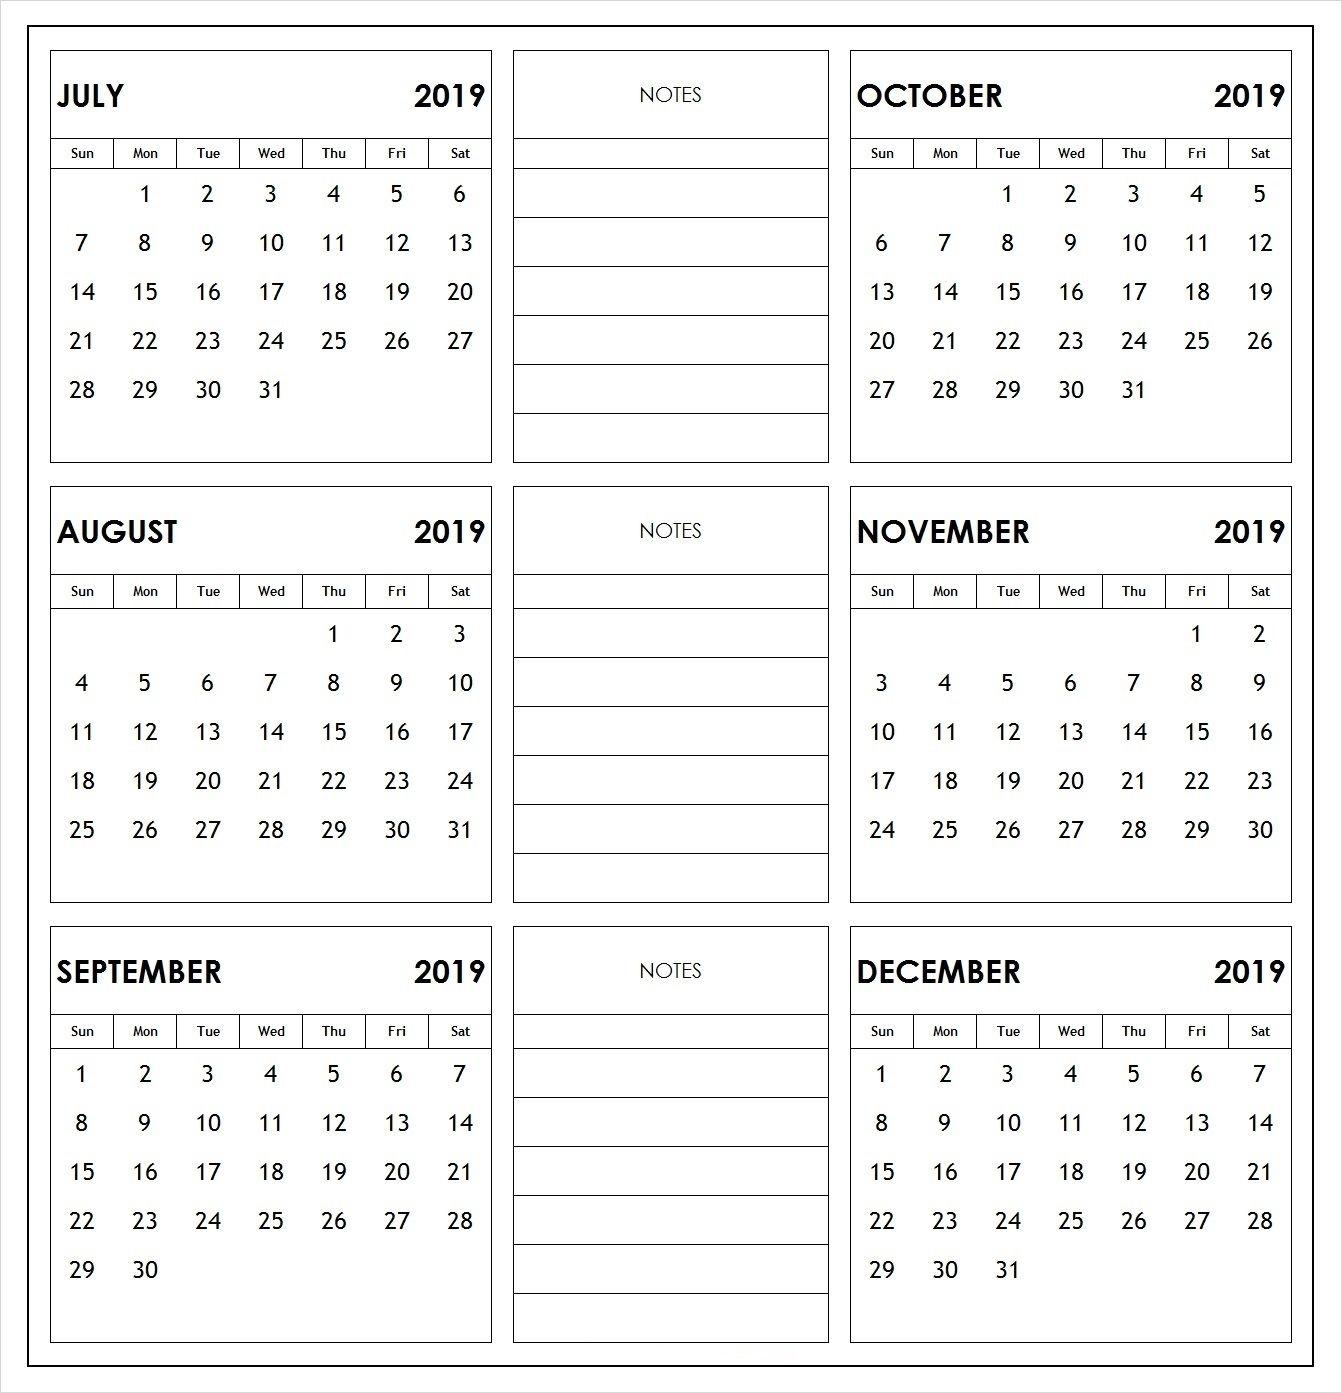 Take Calendar 2019 August Through December ⋆ The Best